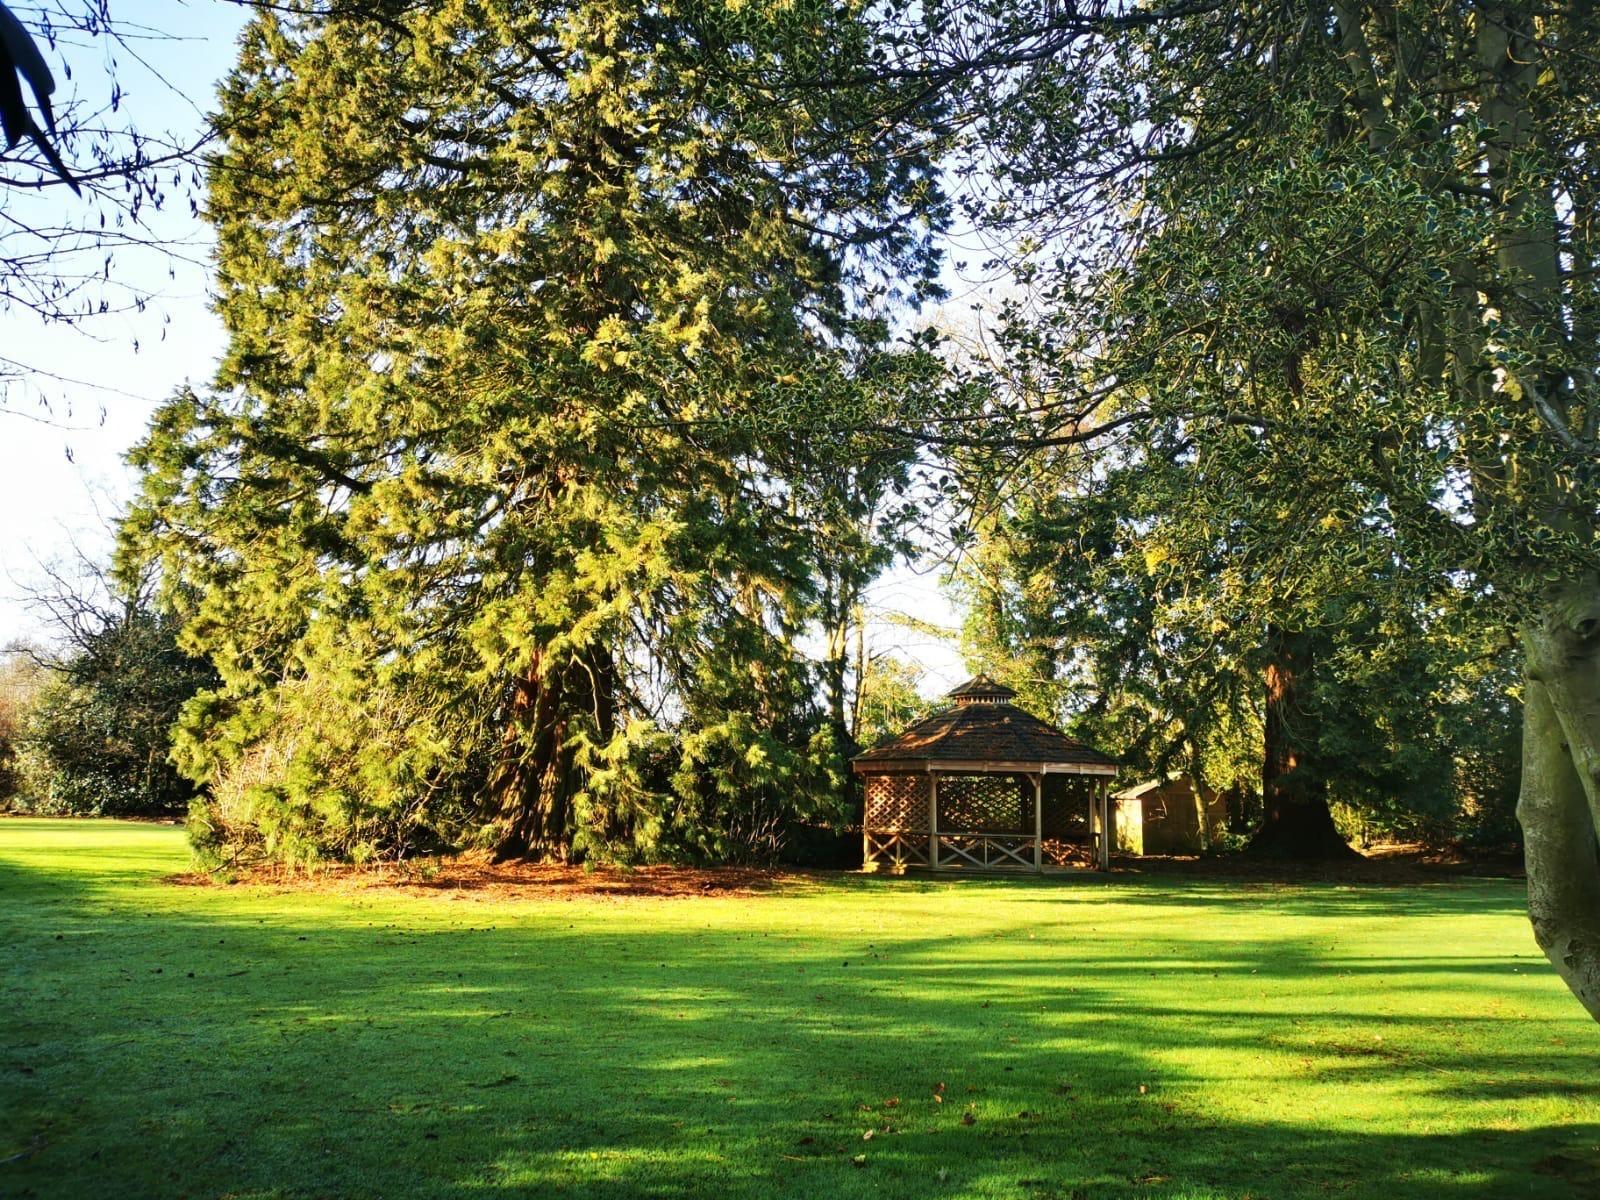 Sunny Woodside garden - our photo